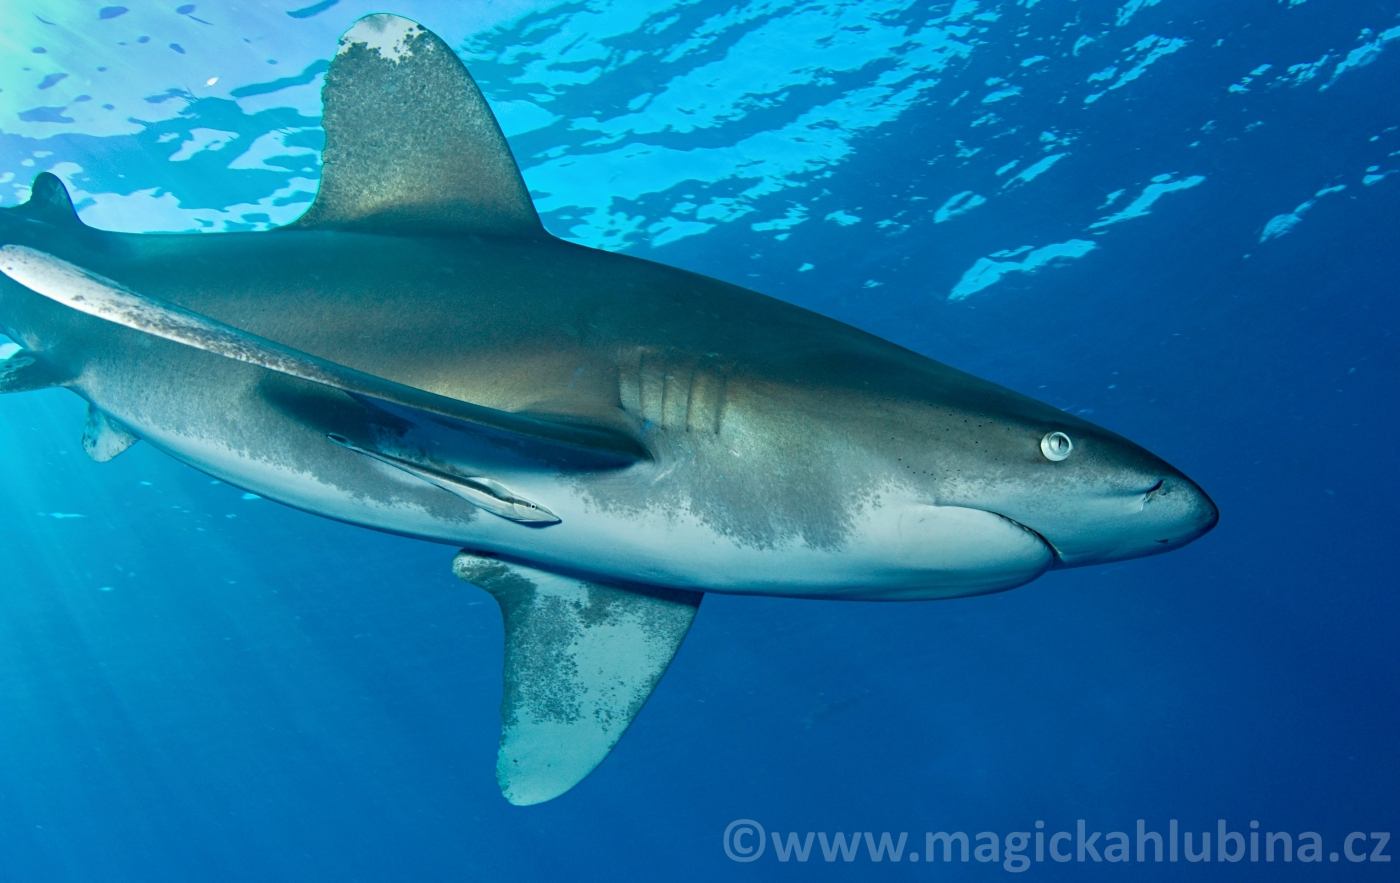 Carcharhinus_longimanus_-_Oceanic_Whitetip_Shark